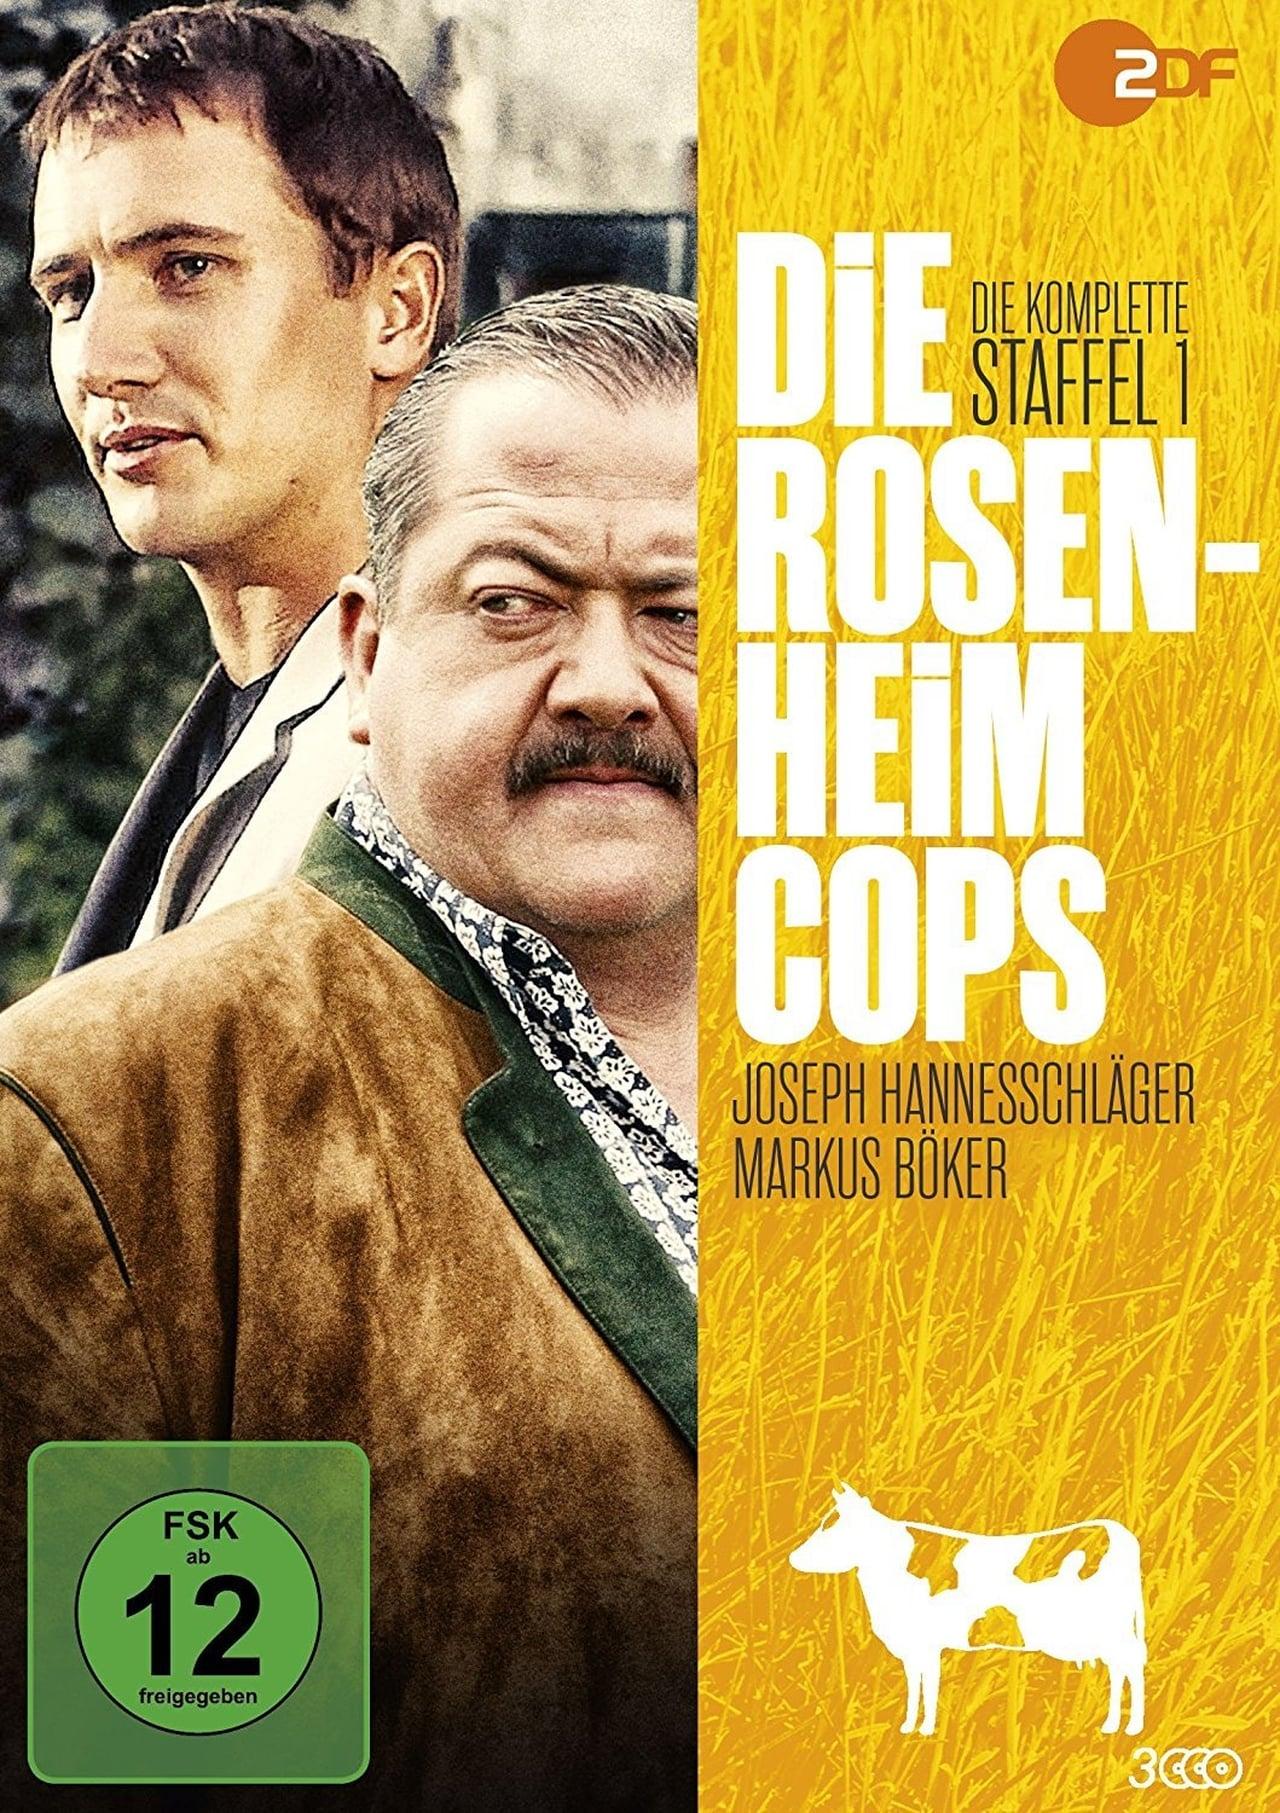 Watch The Rosenheim Cops Season 1 Online